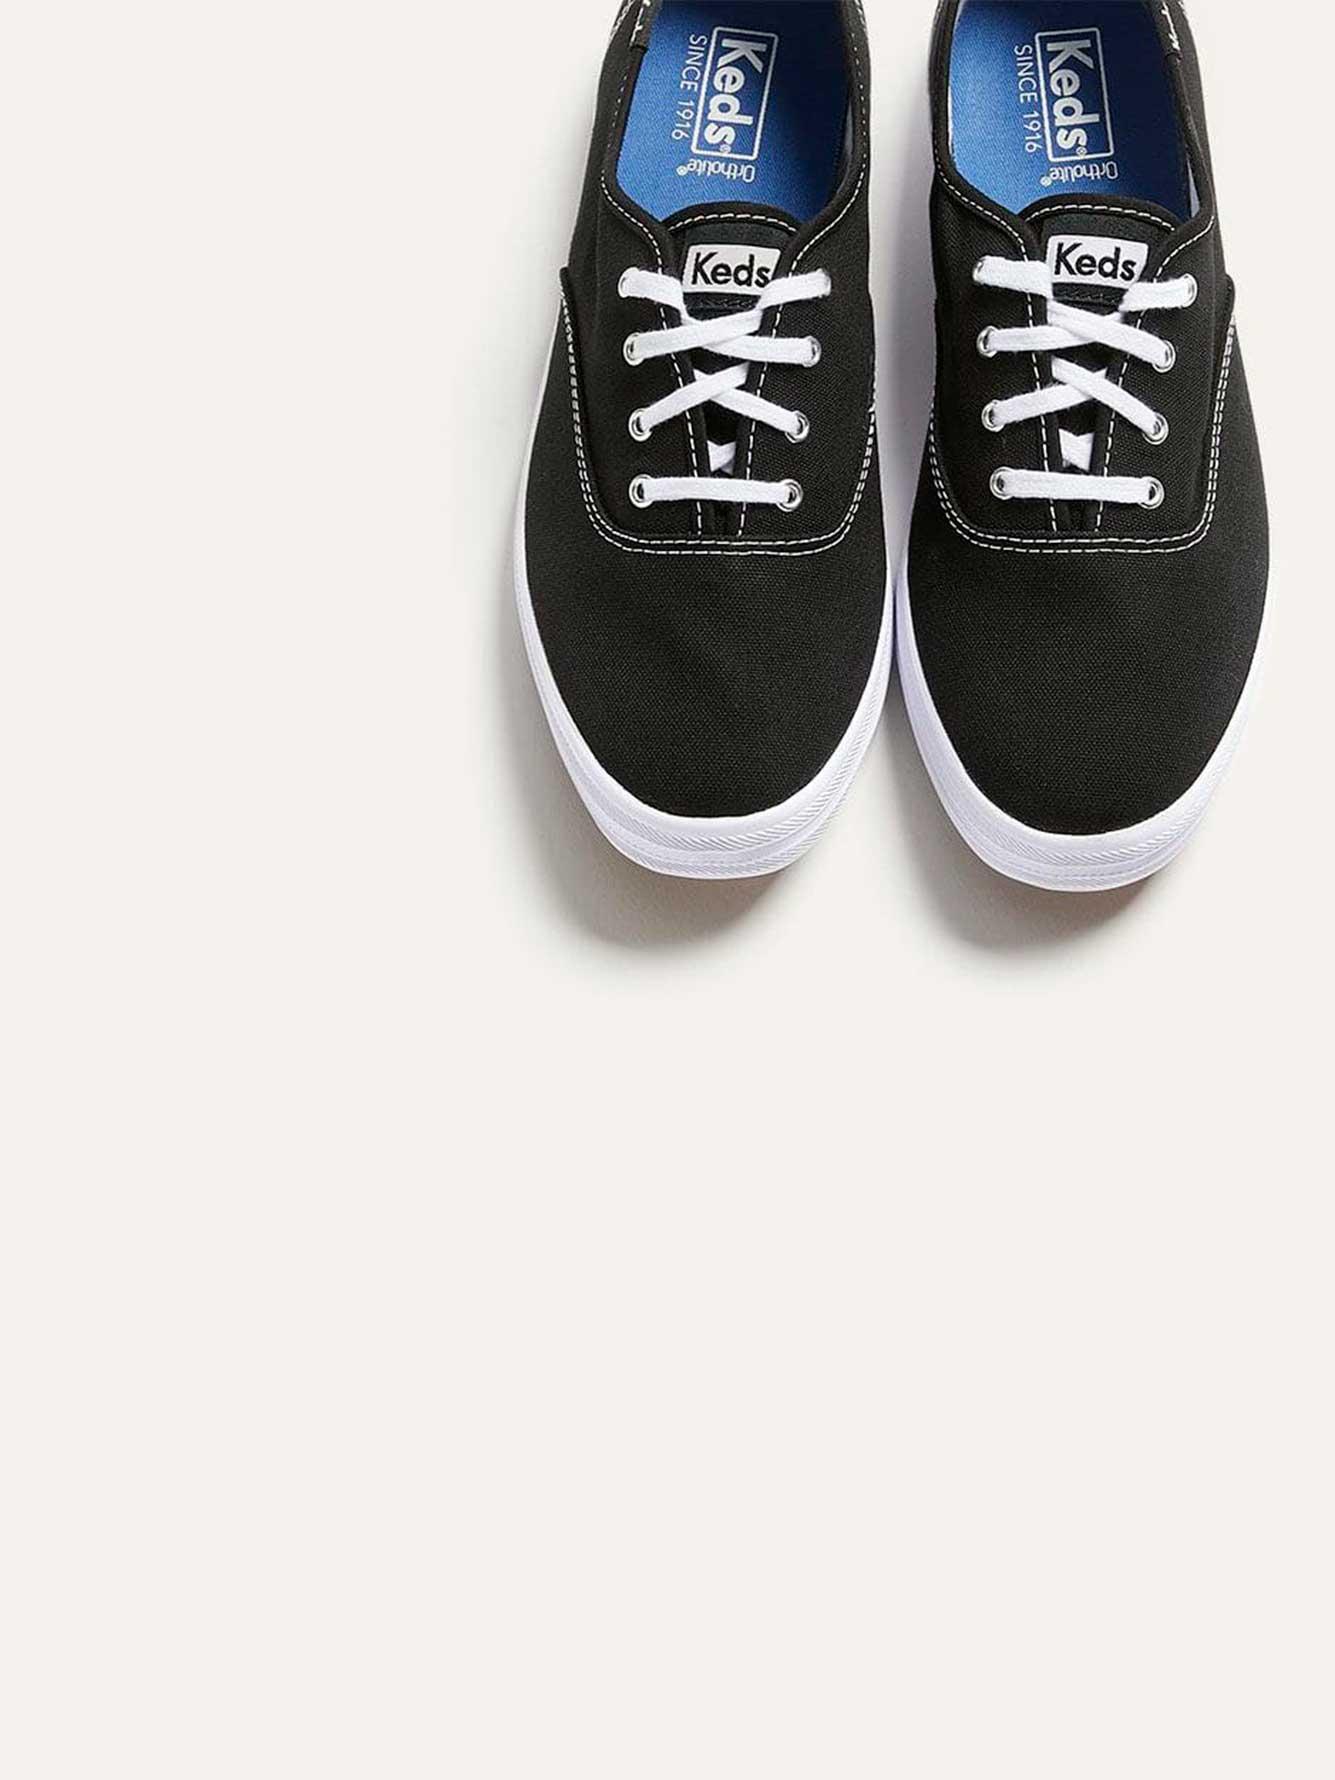 e317f191c66 Wide Champion Oxford Canvas Shoes - Keds